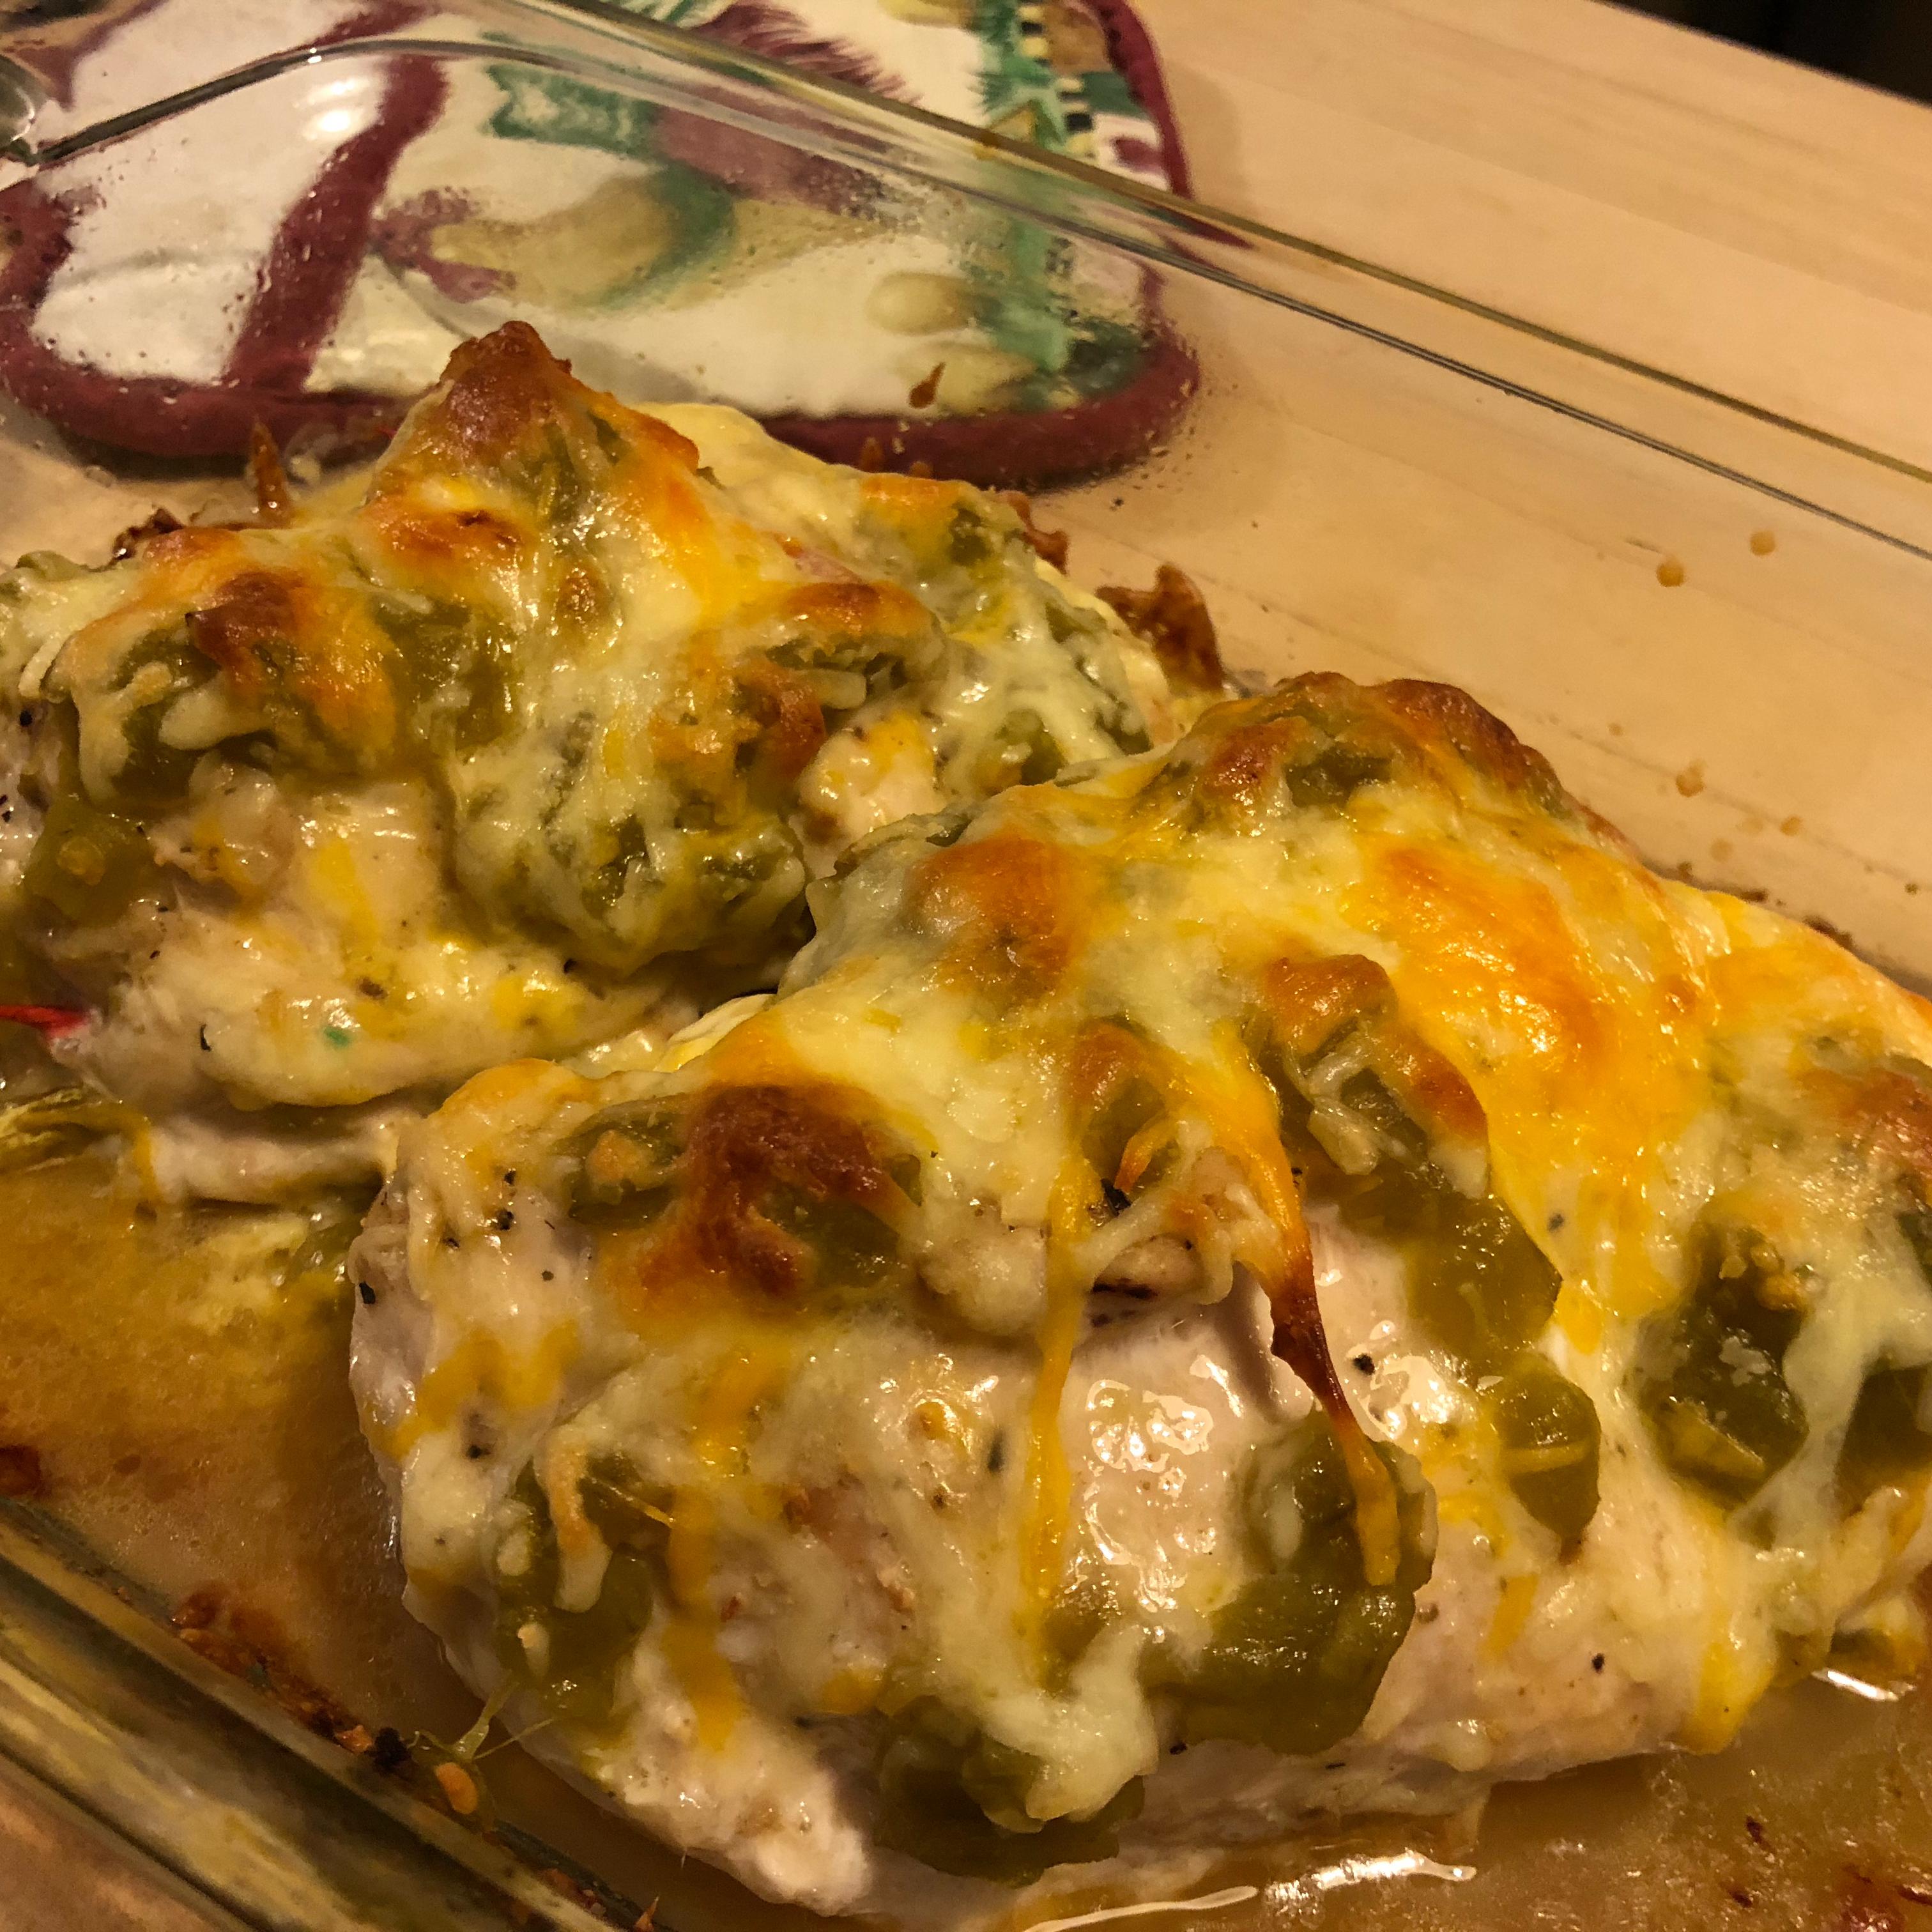 Green Chili and Cheese Chicken